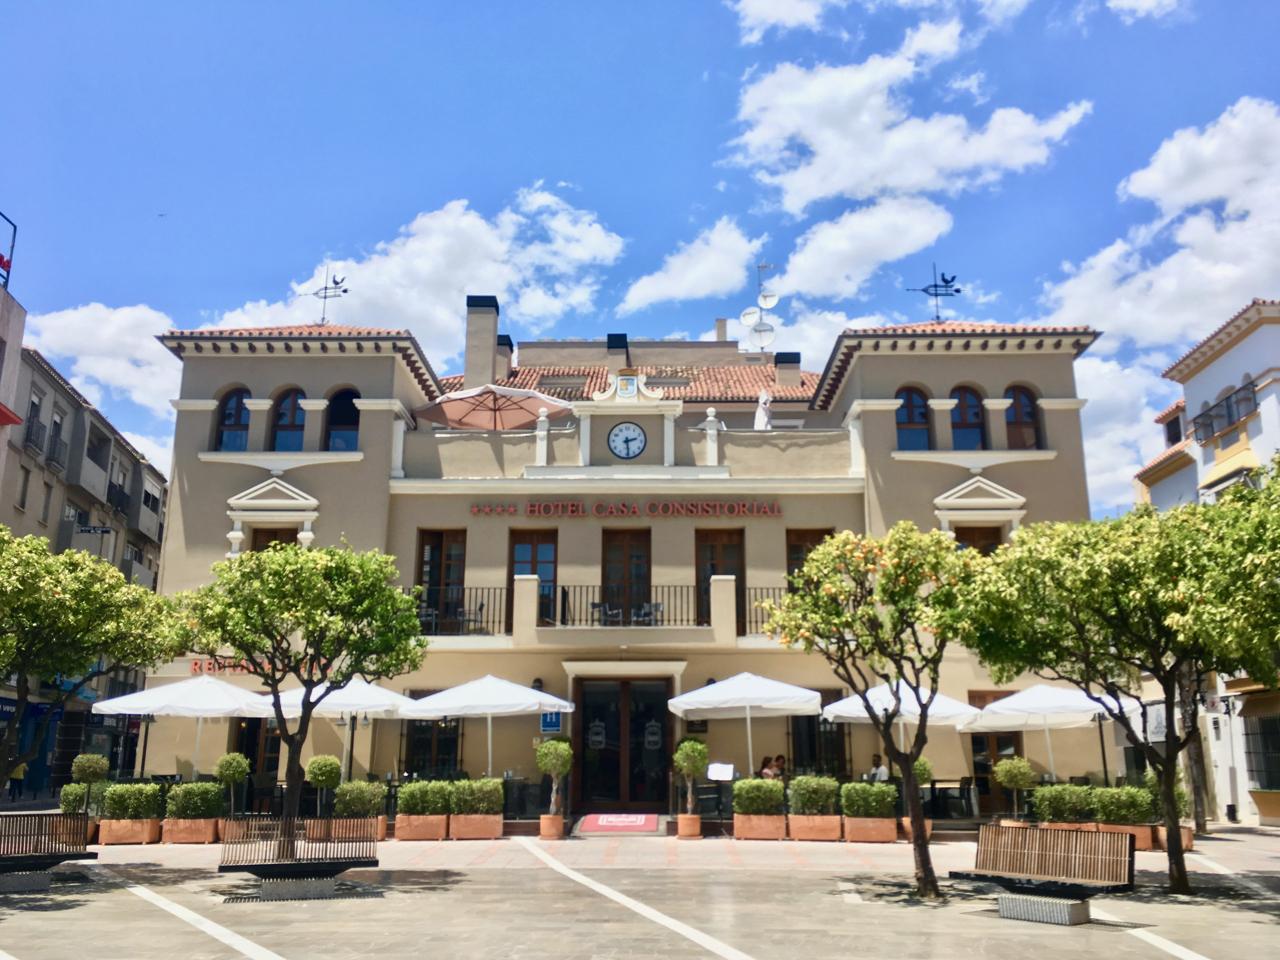 Hotels in Fuengirola - Casa Consistorial